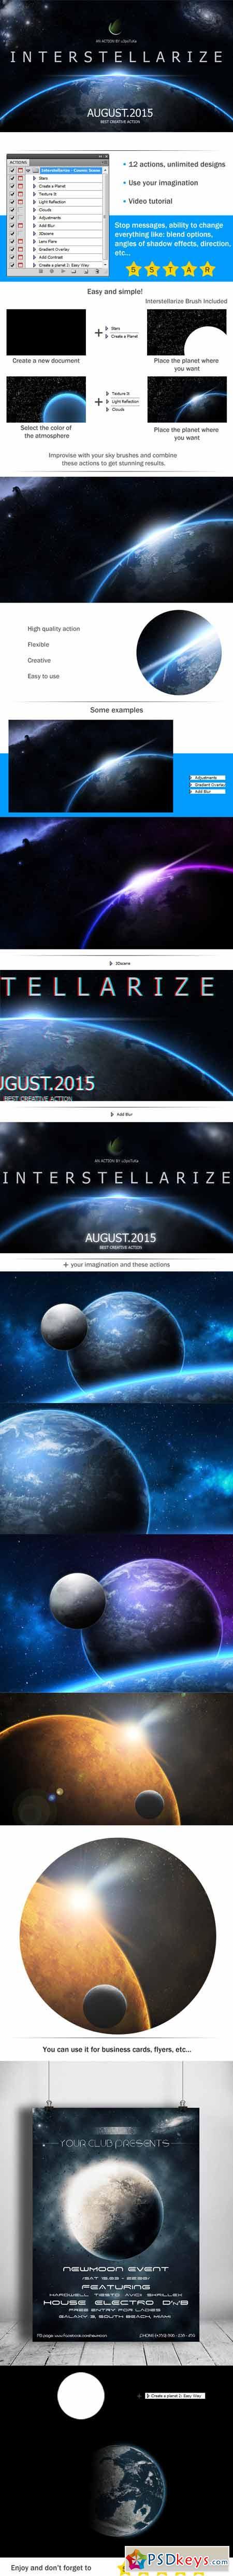 Interstellarize - Cosmic Scene Action 12576310